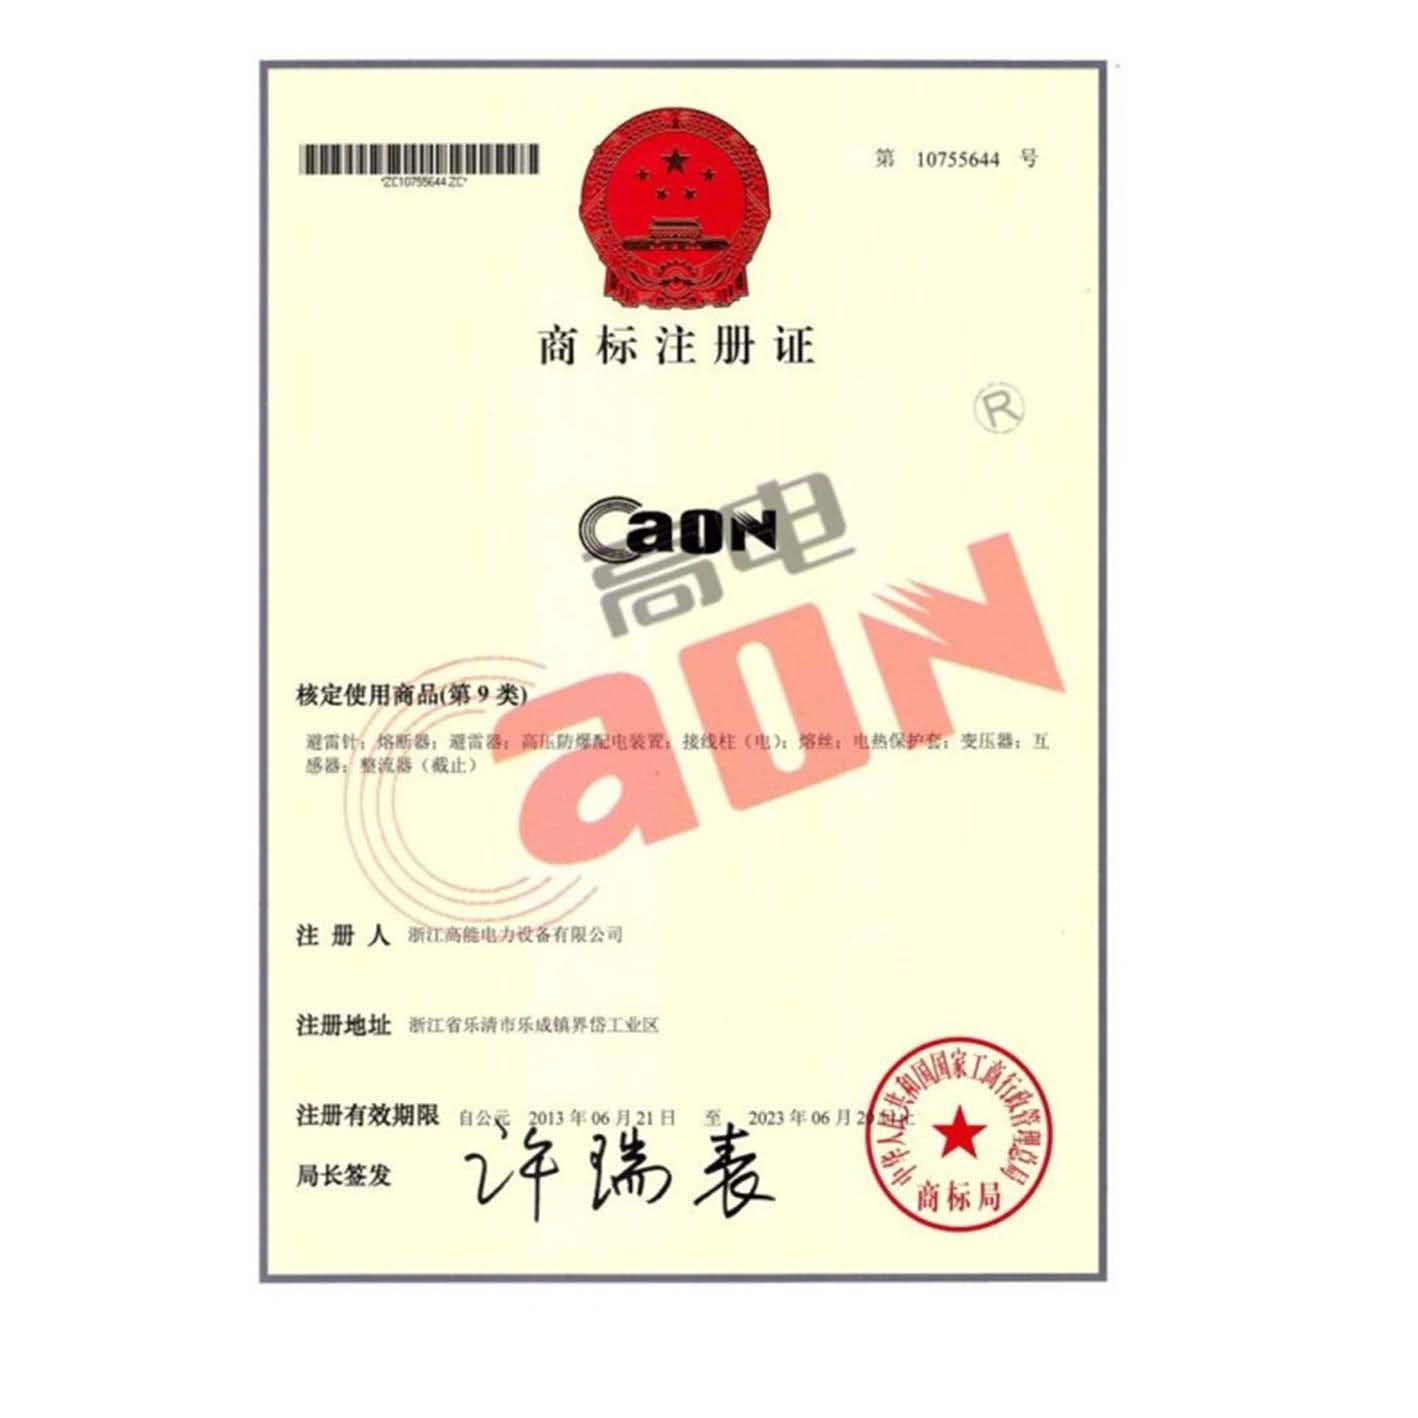 CAON-商标注册